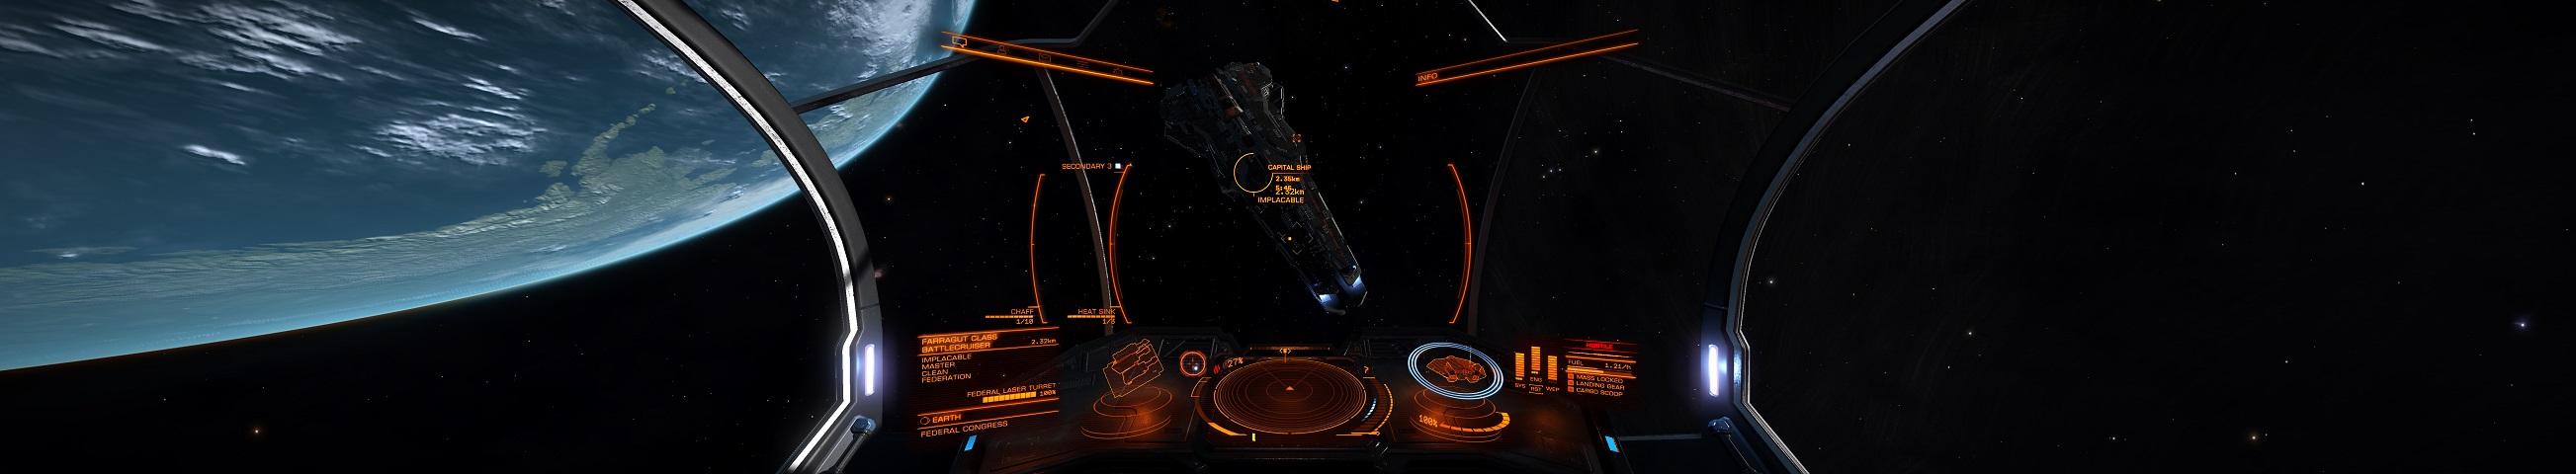 Im Sol System ging es los, zufällig ein Capital Ship getroffen...